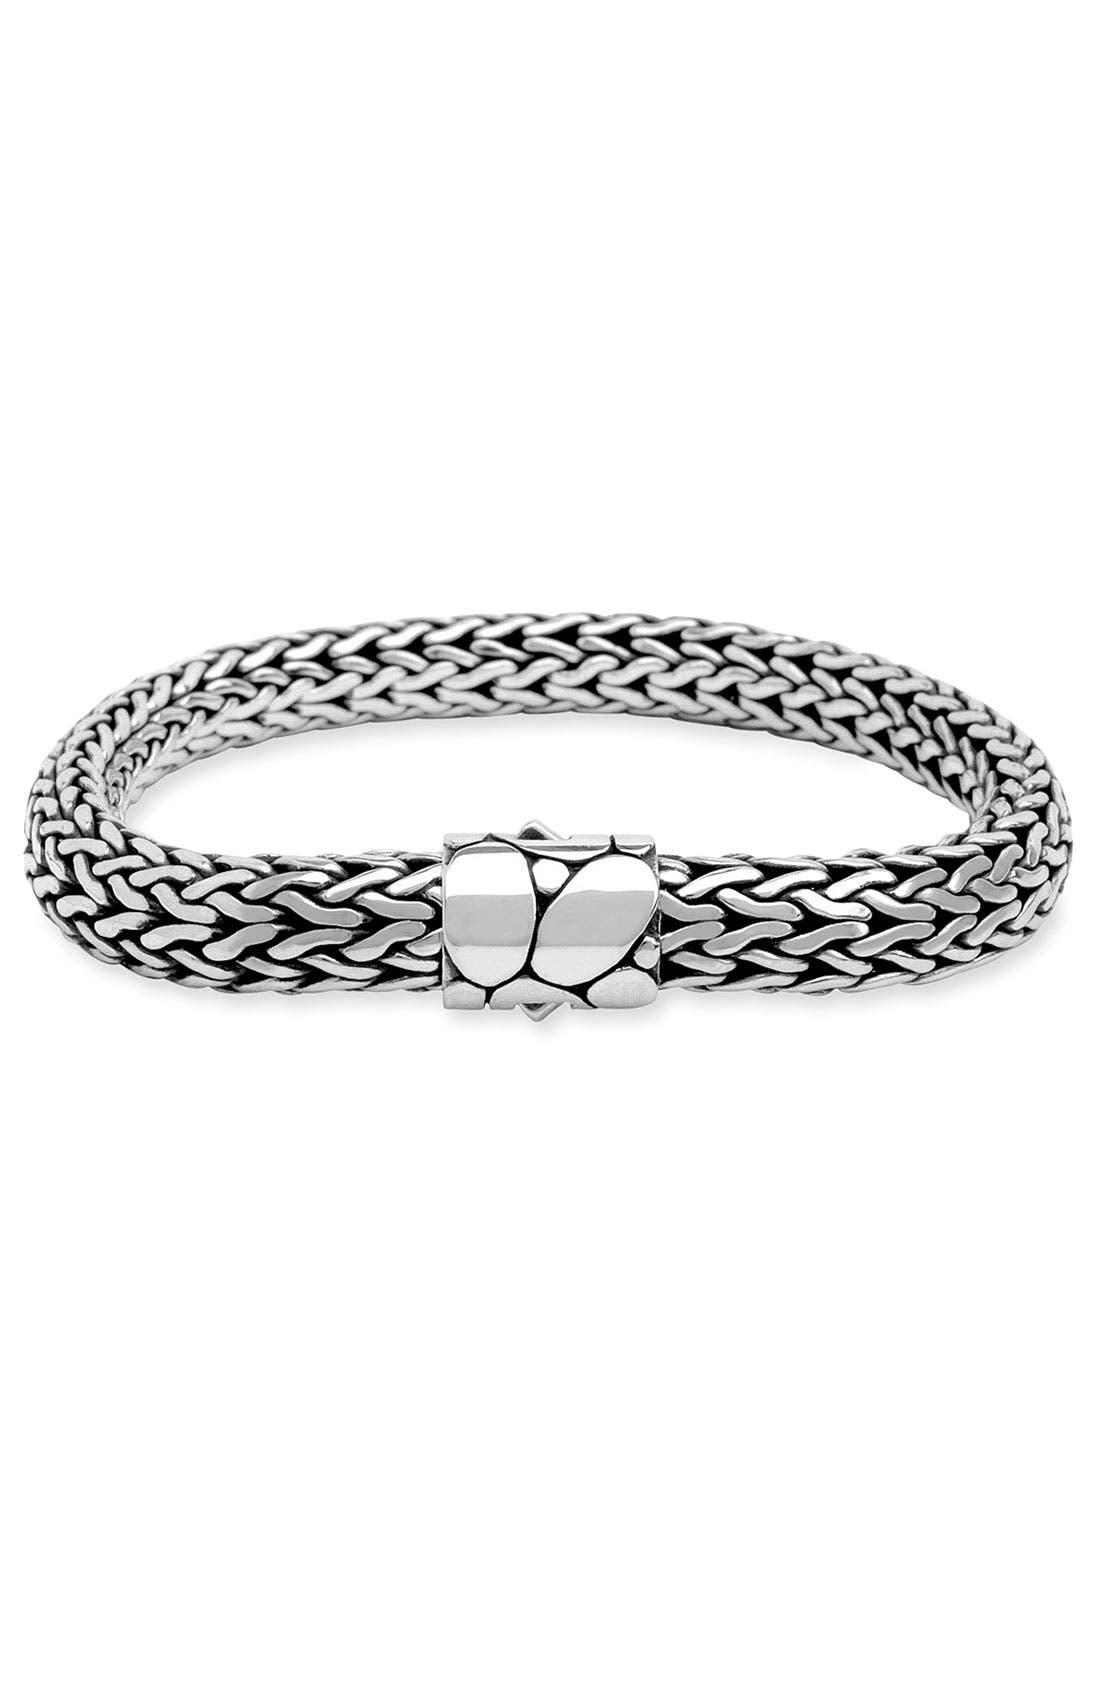 Alternate Image 1 Selected - John Hardy 'Kali' Sterling Silver Bracelet